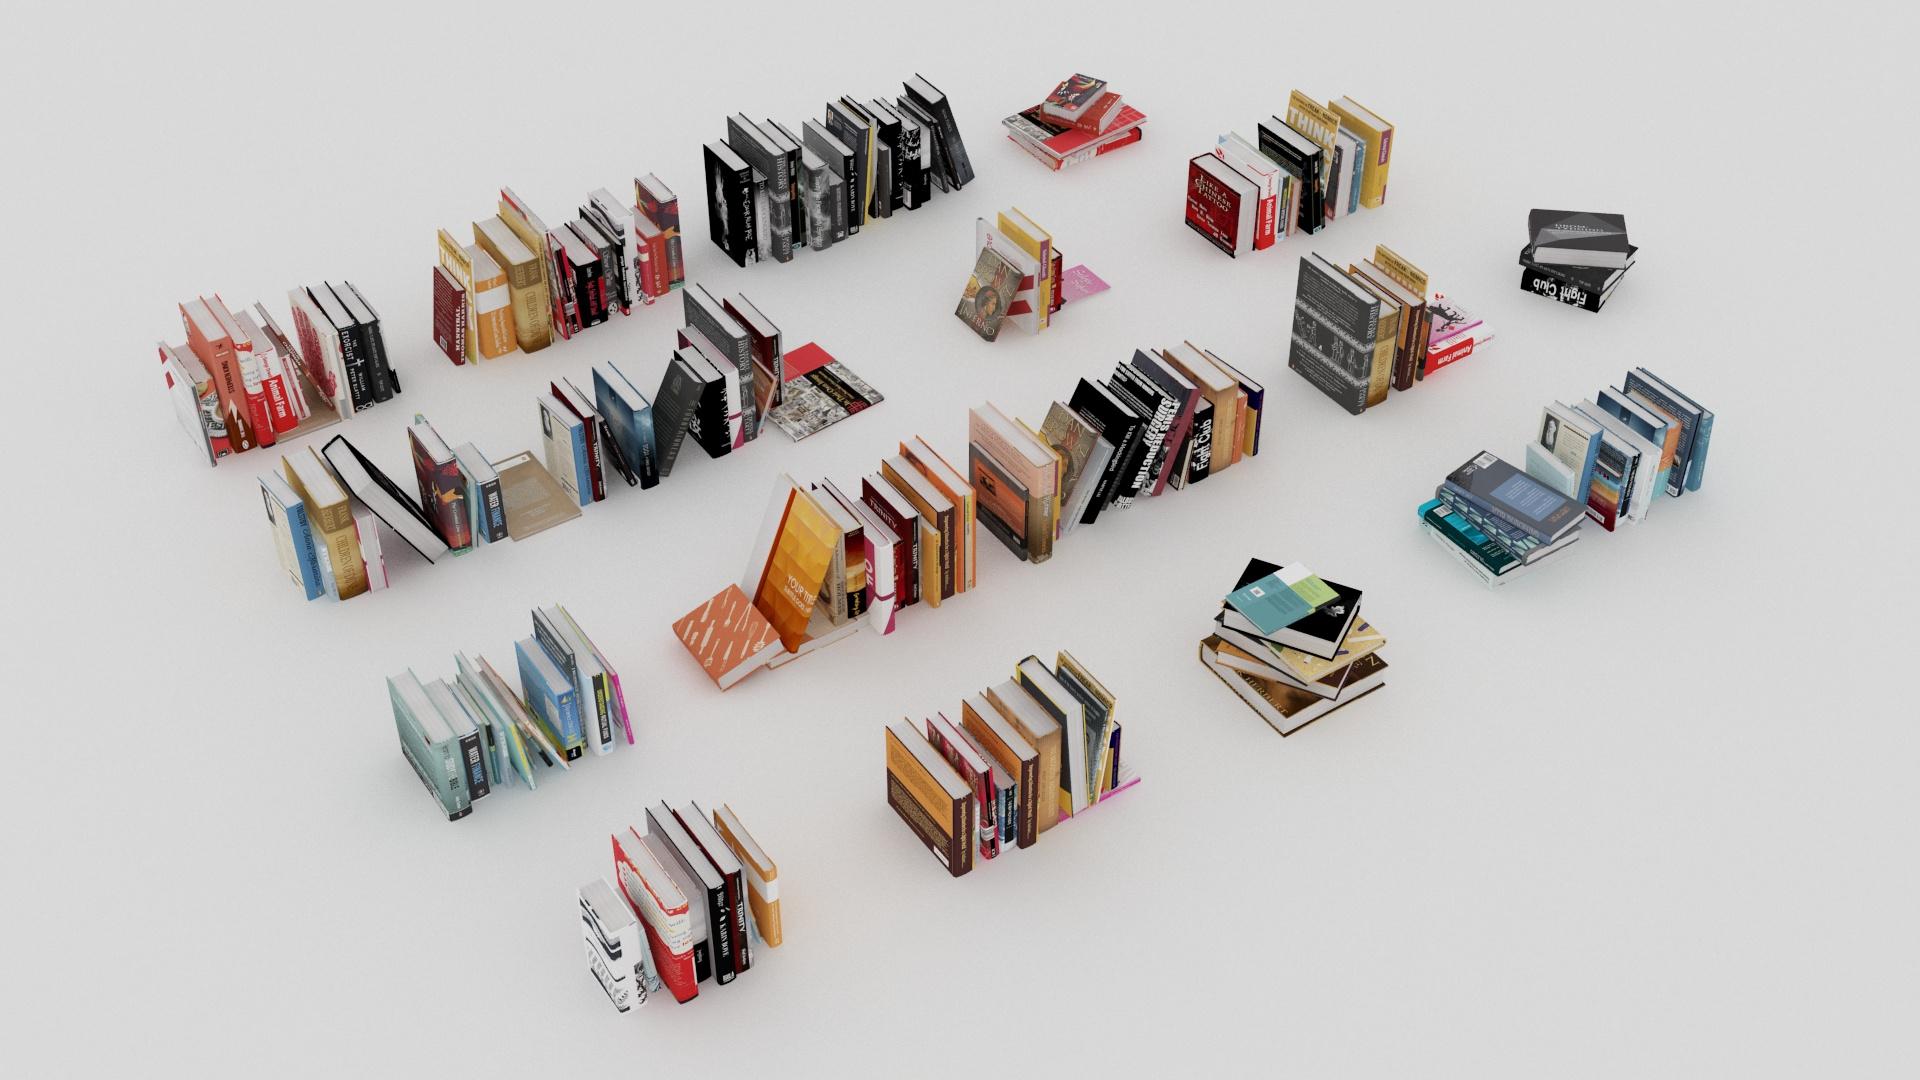 100 unique books collection 002